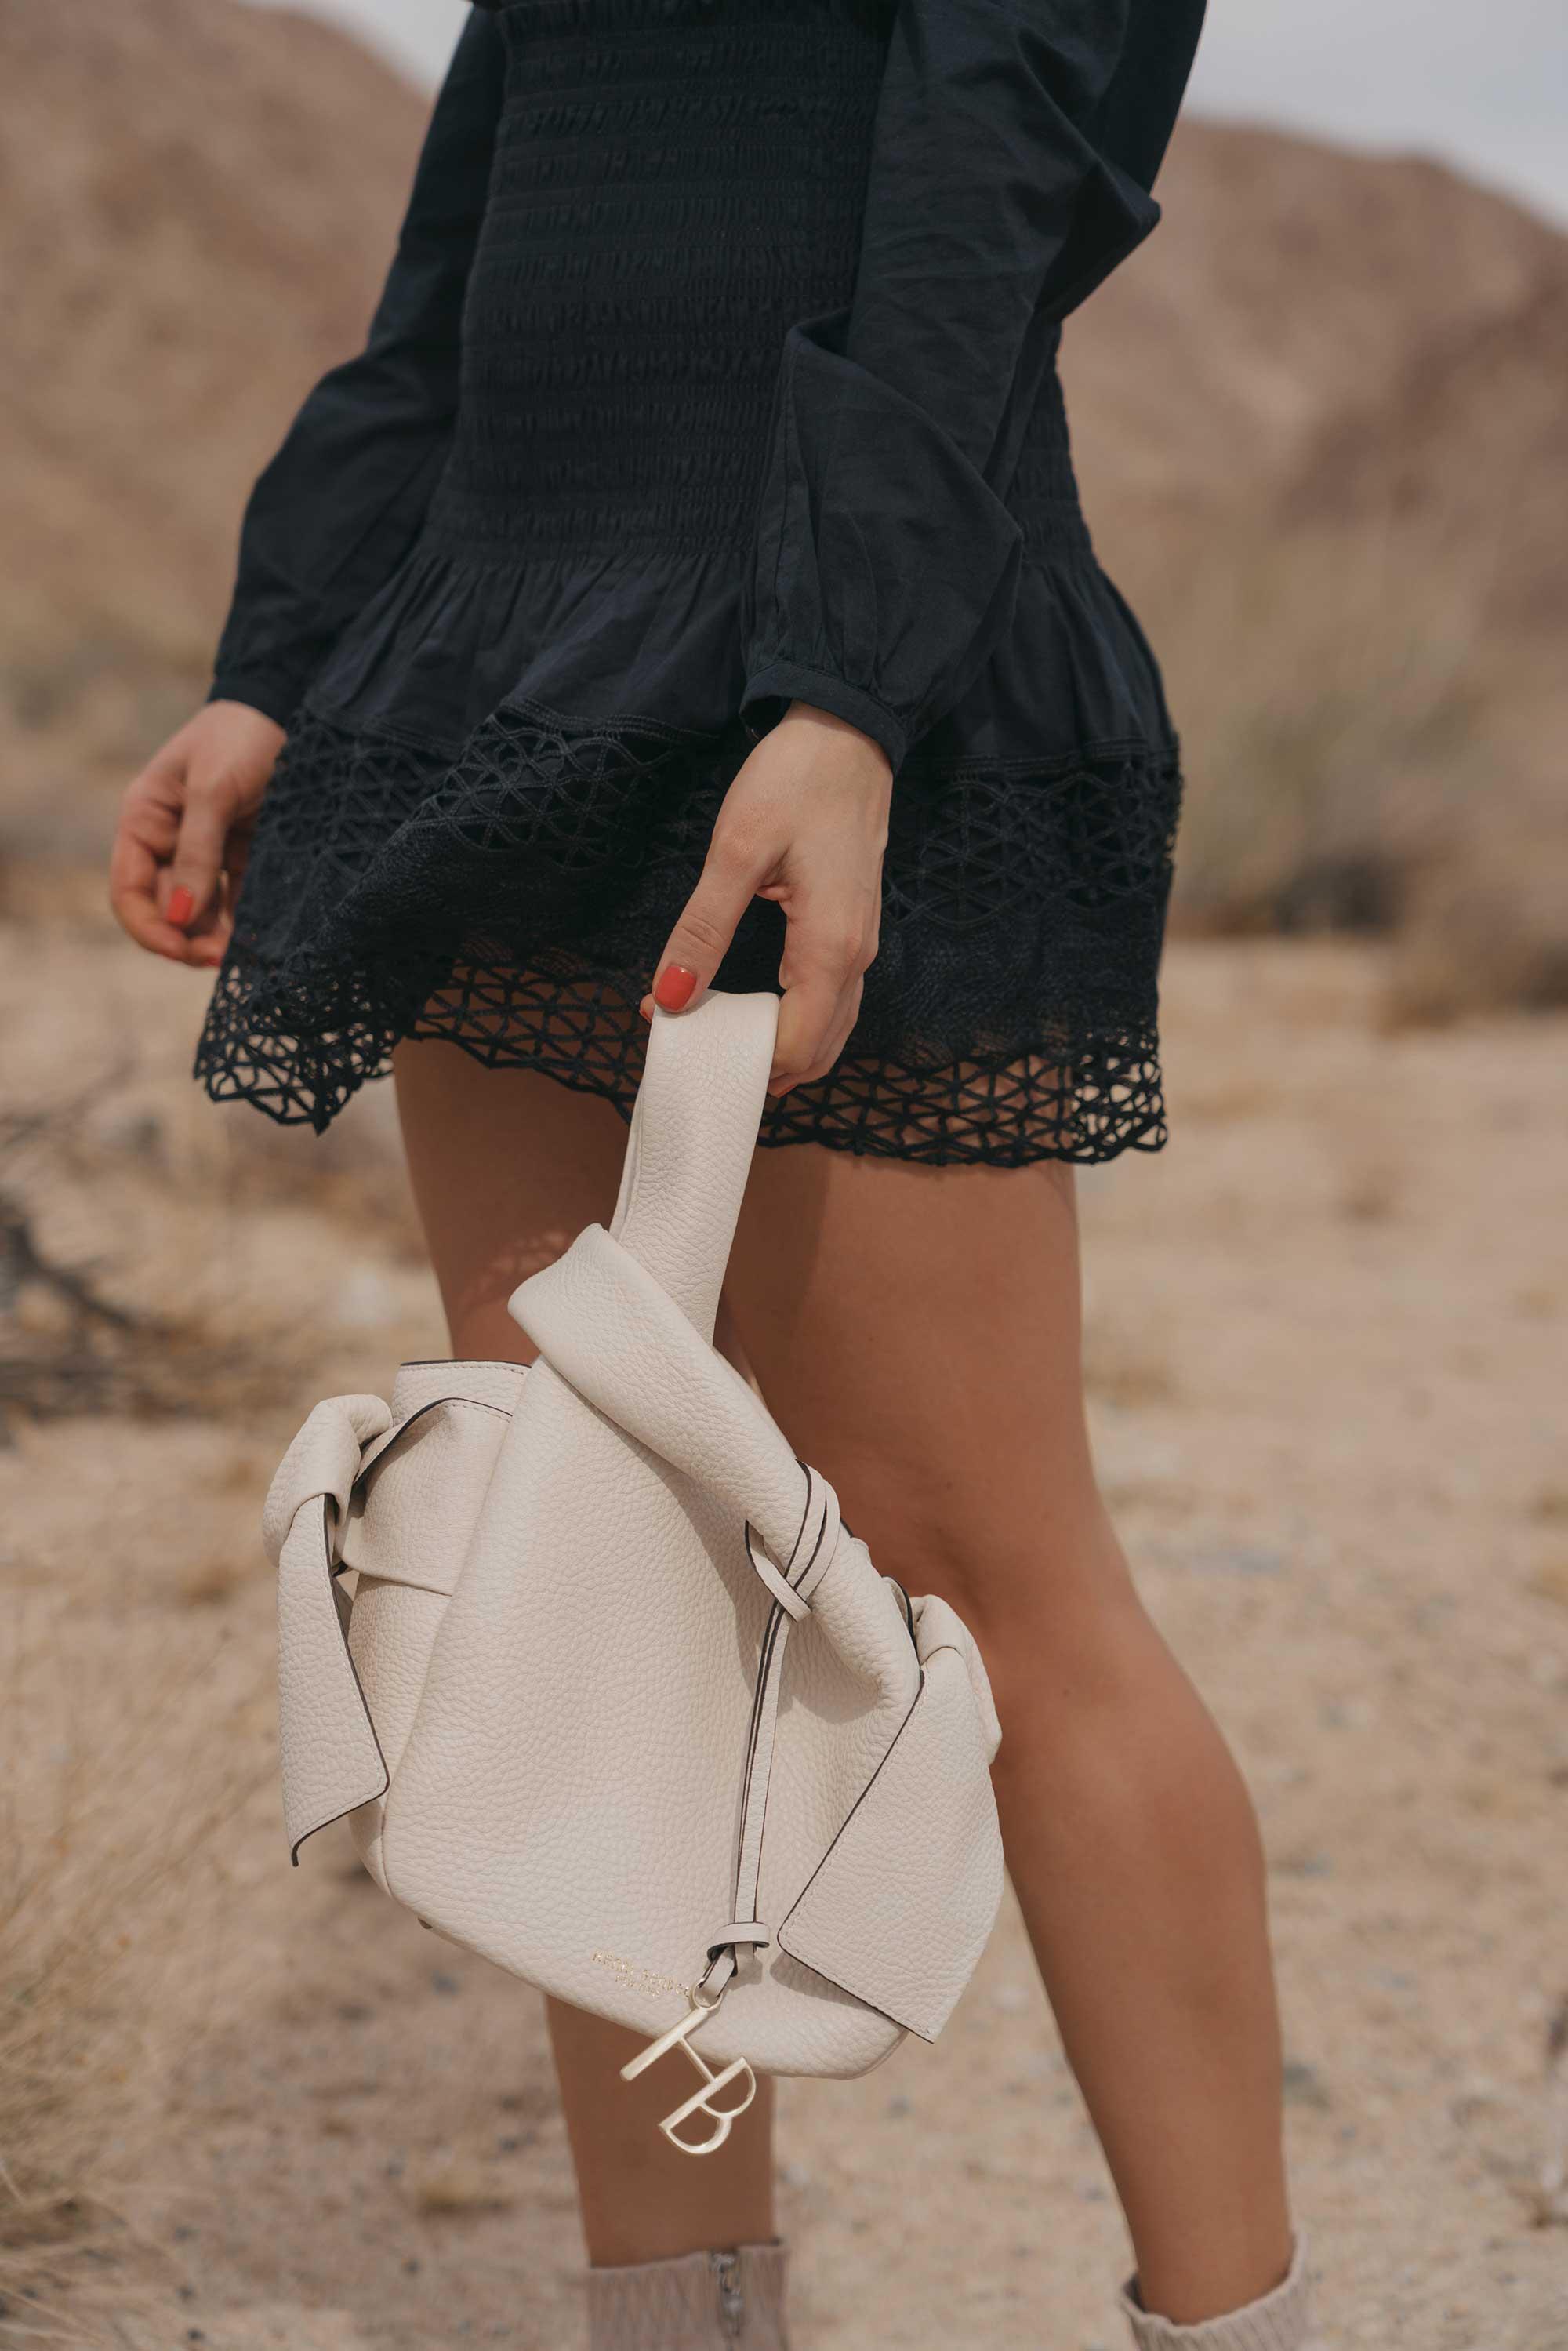 black lace festival outfit for Coachella Desert6.jpg